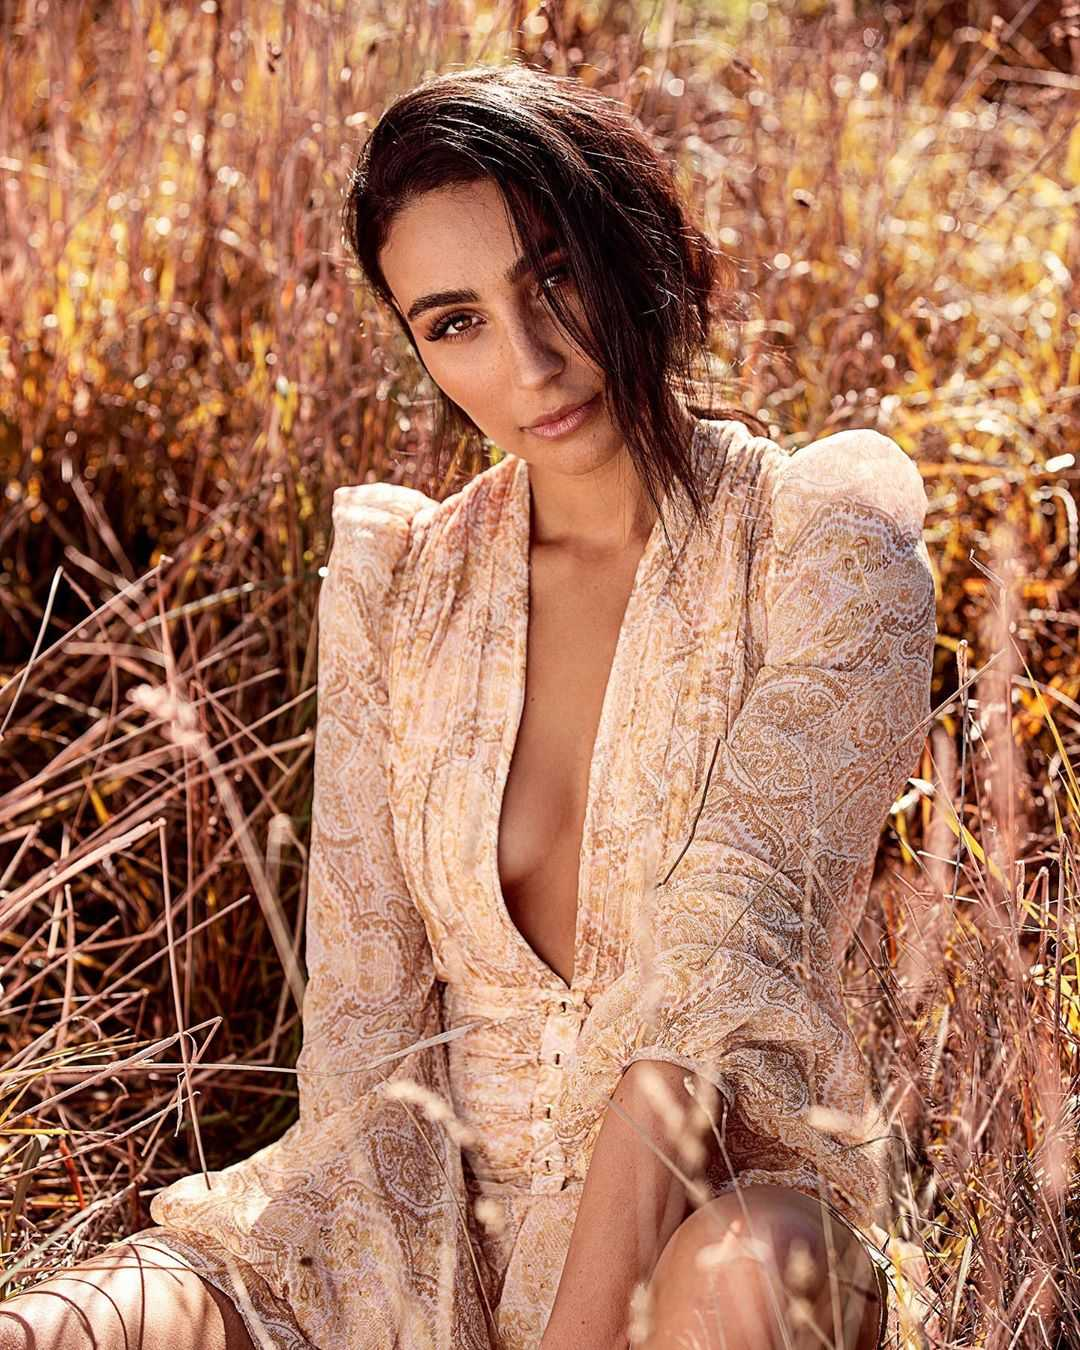 tayla damir cleavage